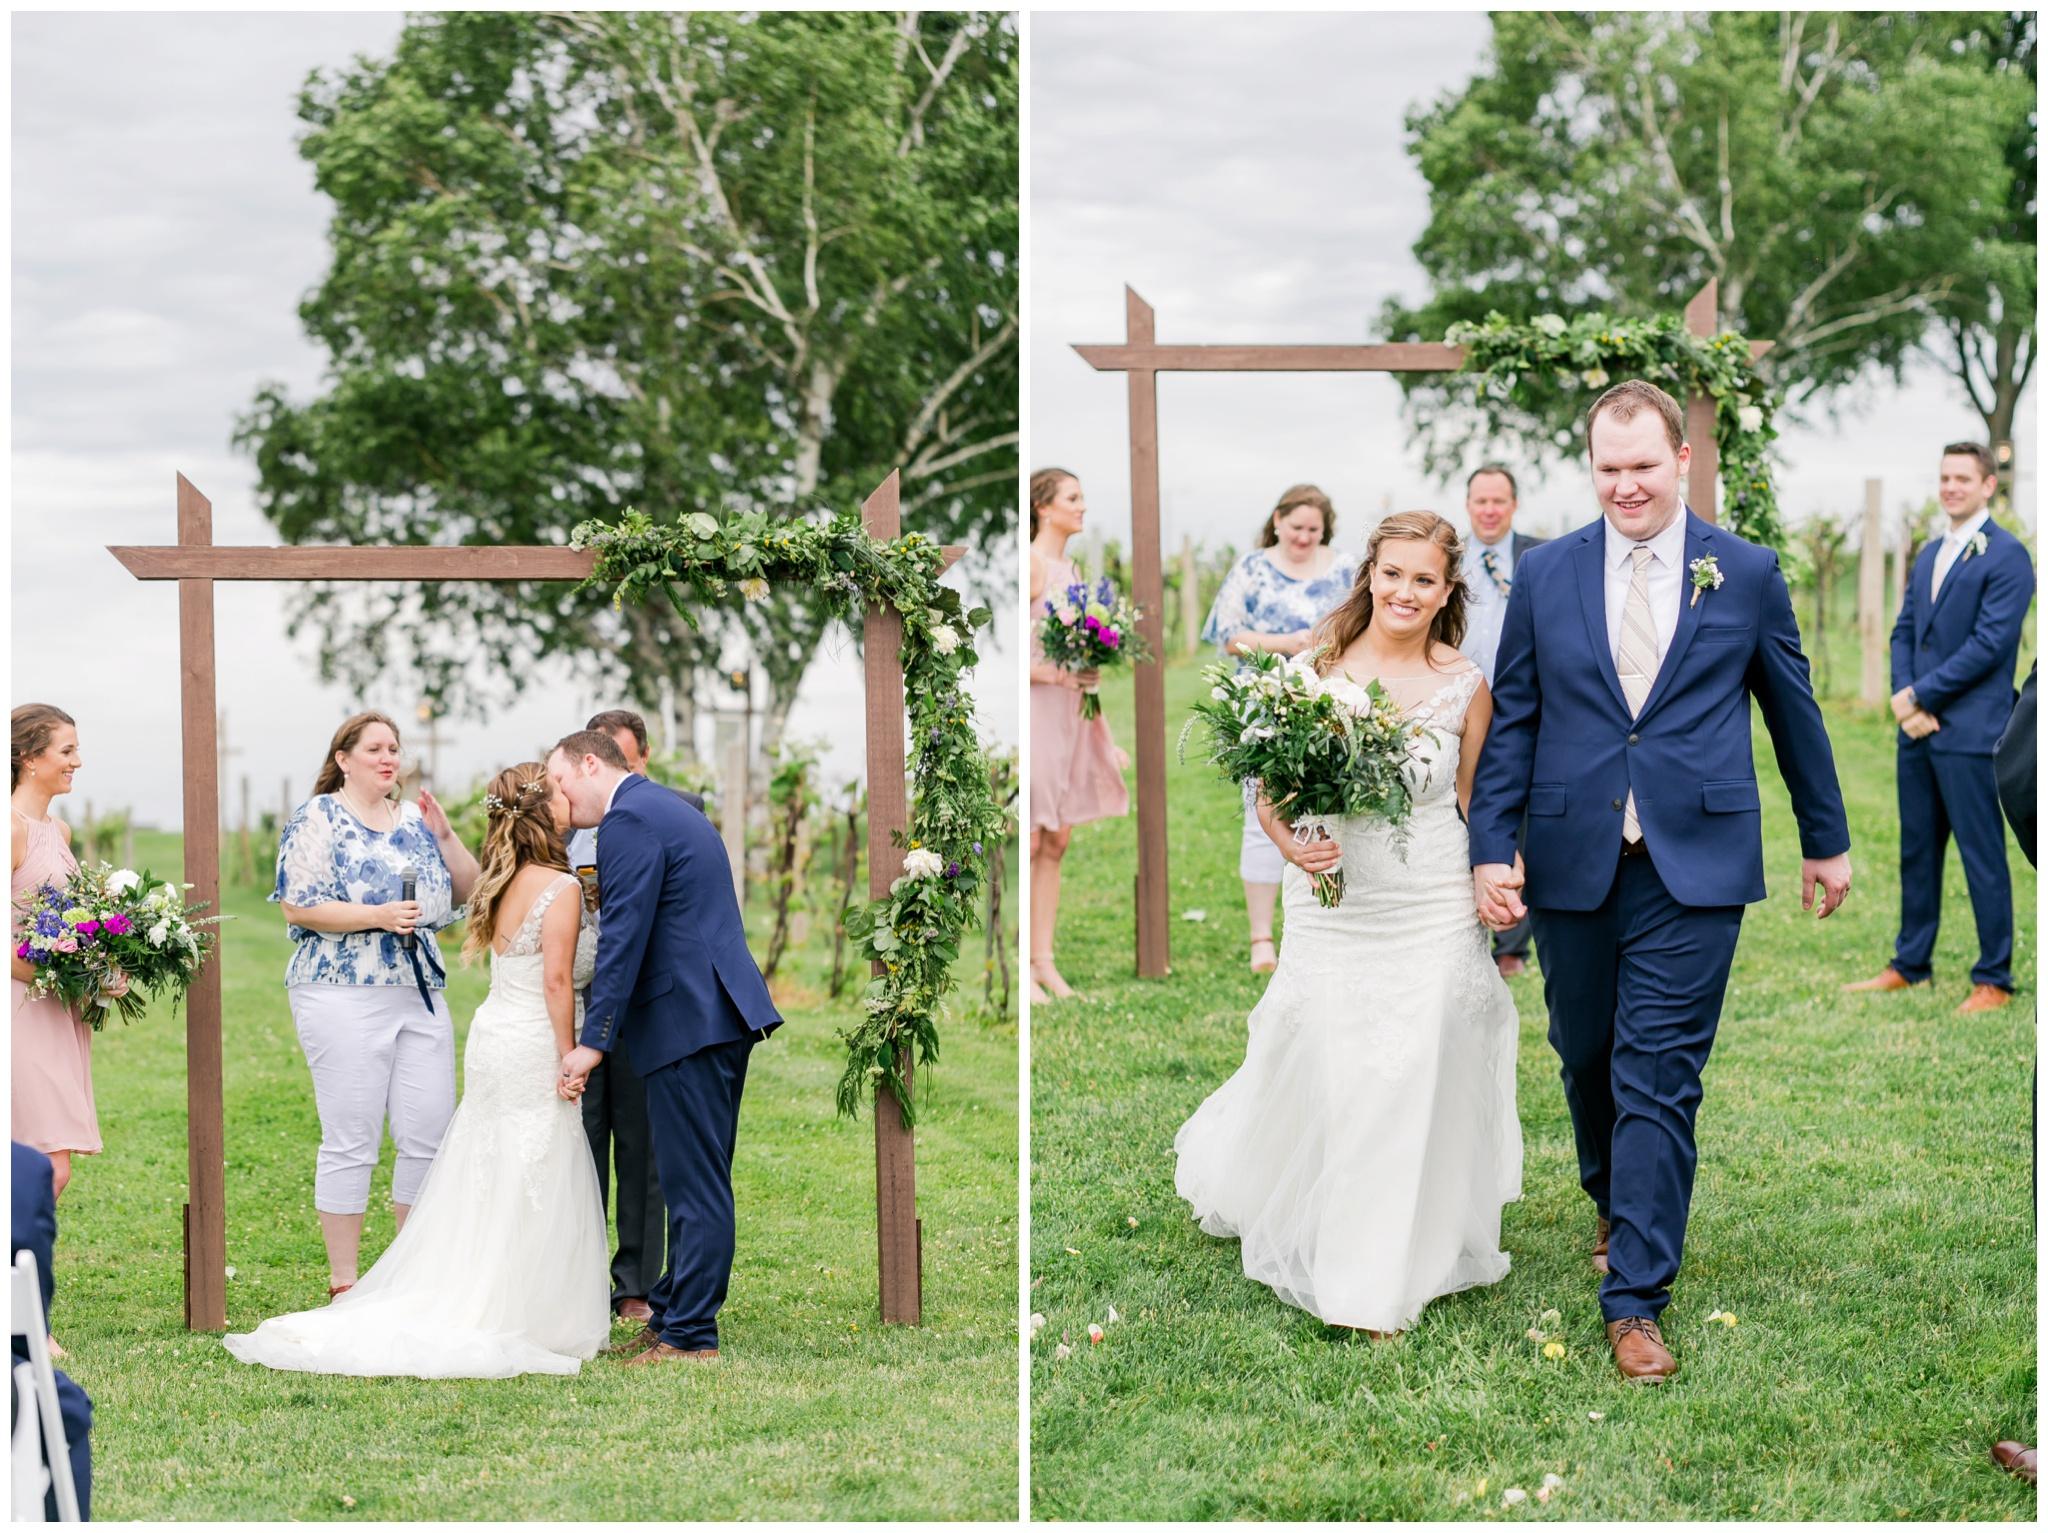 over_the_vines_wedding_edgerton_wisconsin_wedding_caynay_photo_4032.jpg